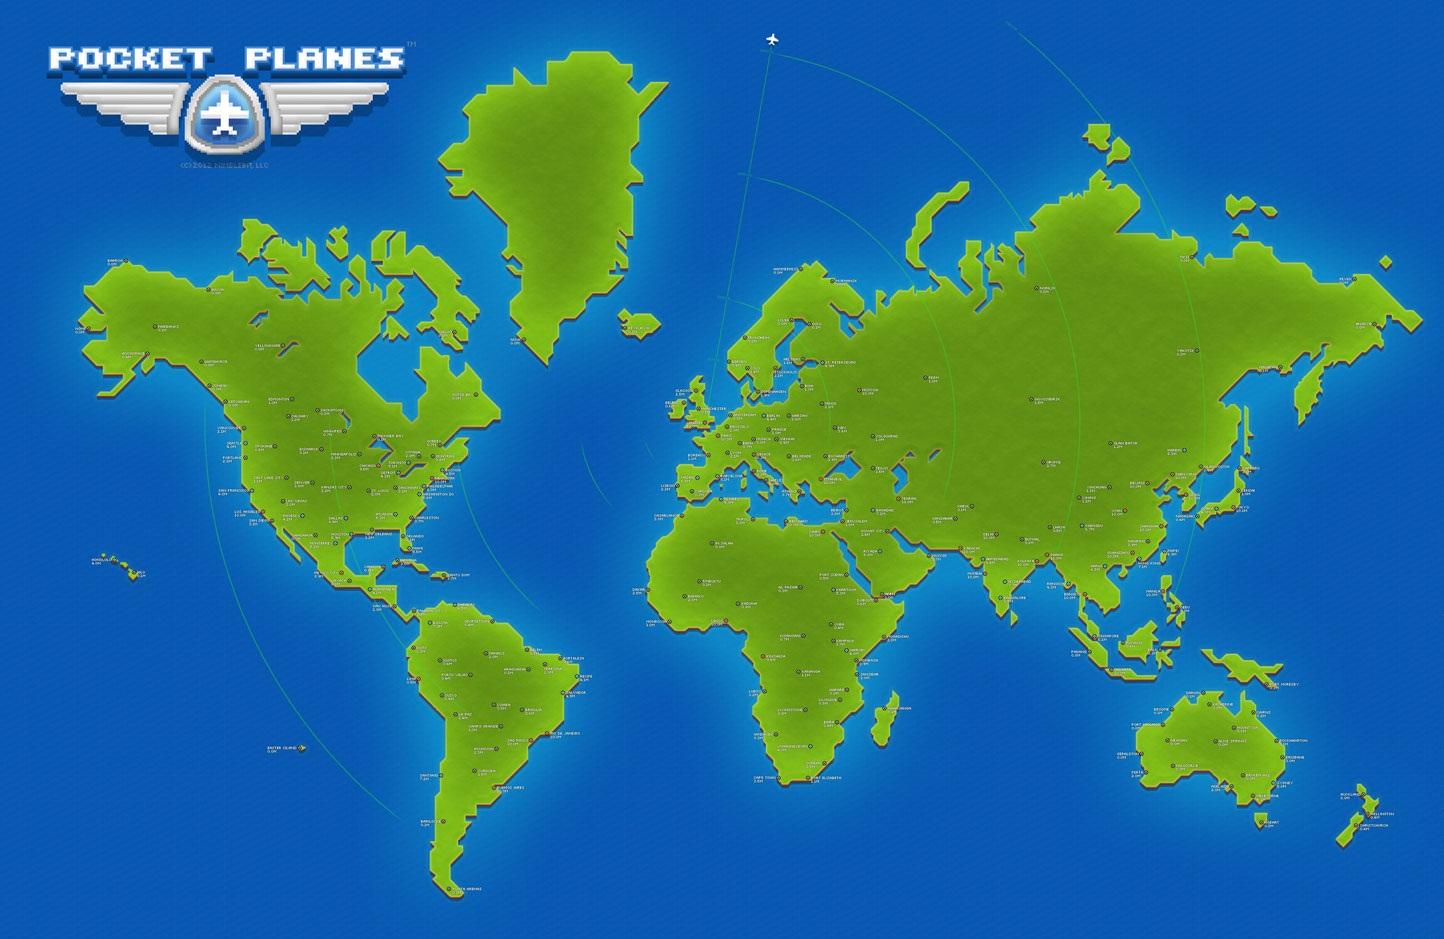 Image world mapg pocket planes wiki fandom powered by wikia world mapg gumiabroncs Gallery